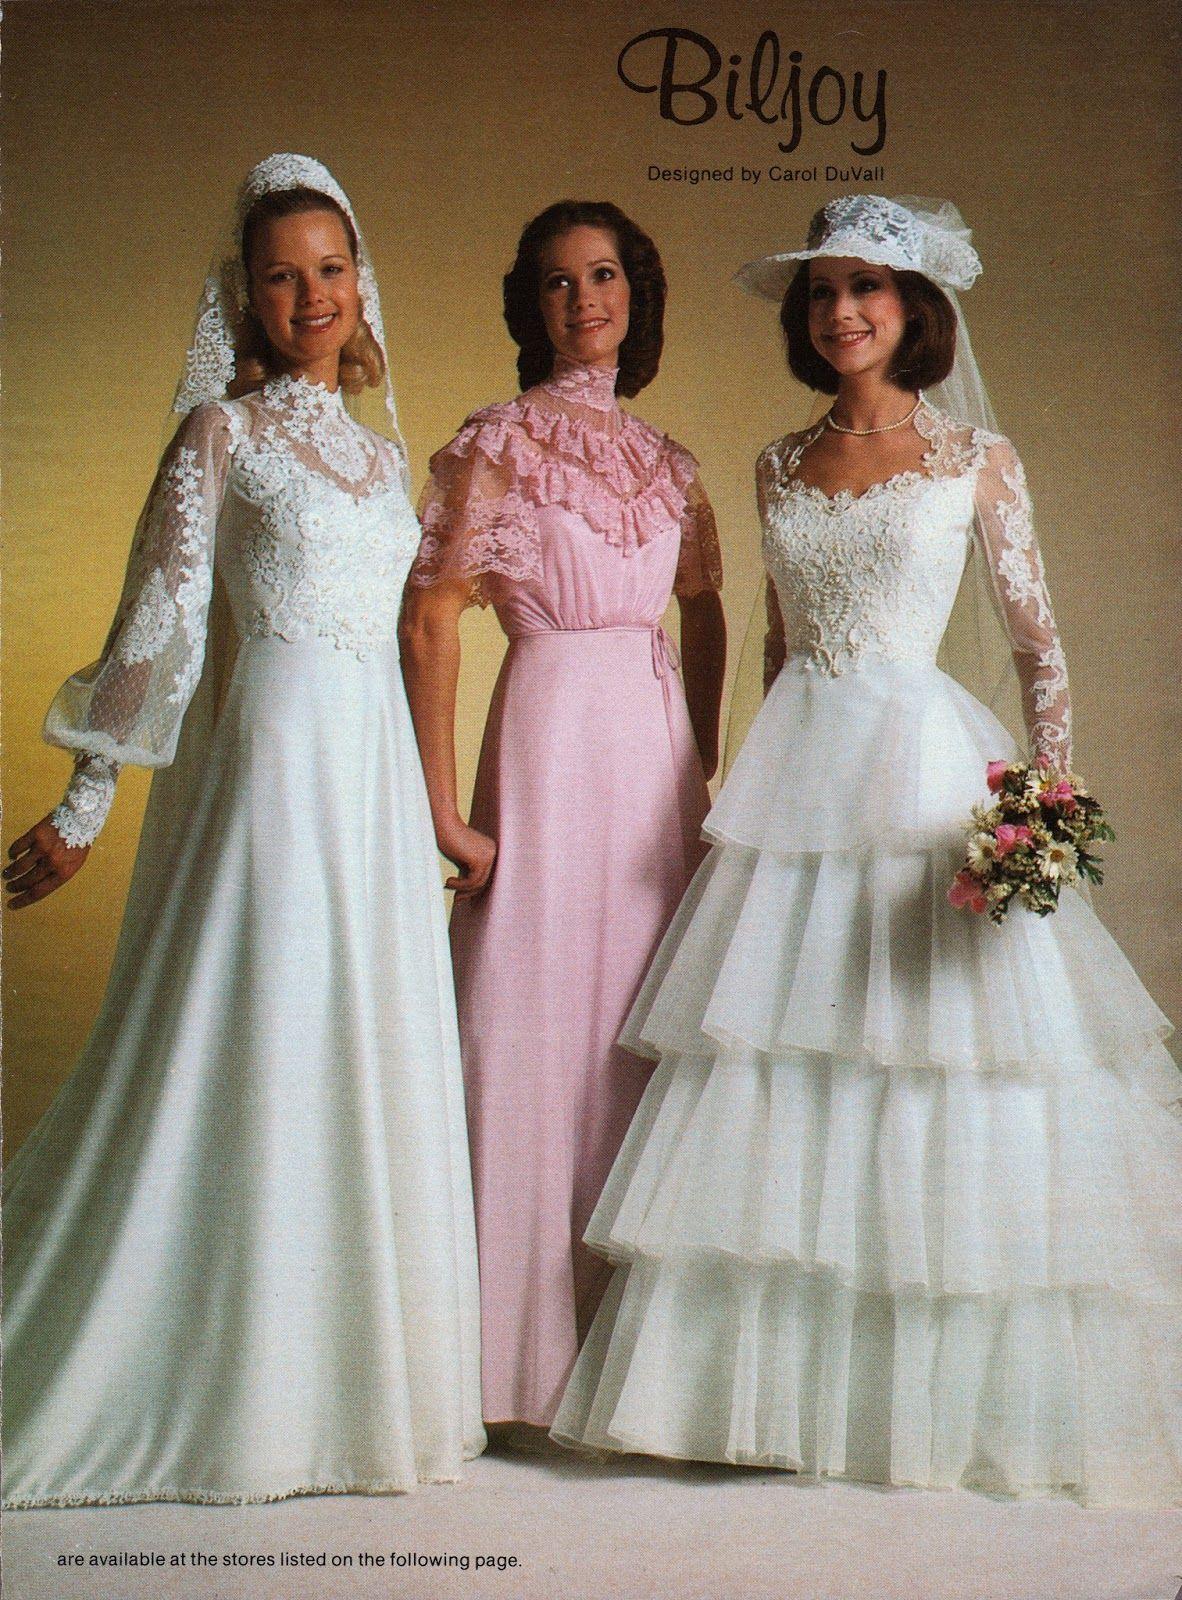 Bridal gowns vintage, 20s wedding dress, Wedding gowns vintage